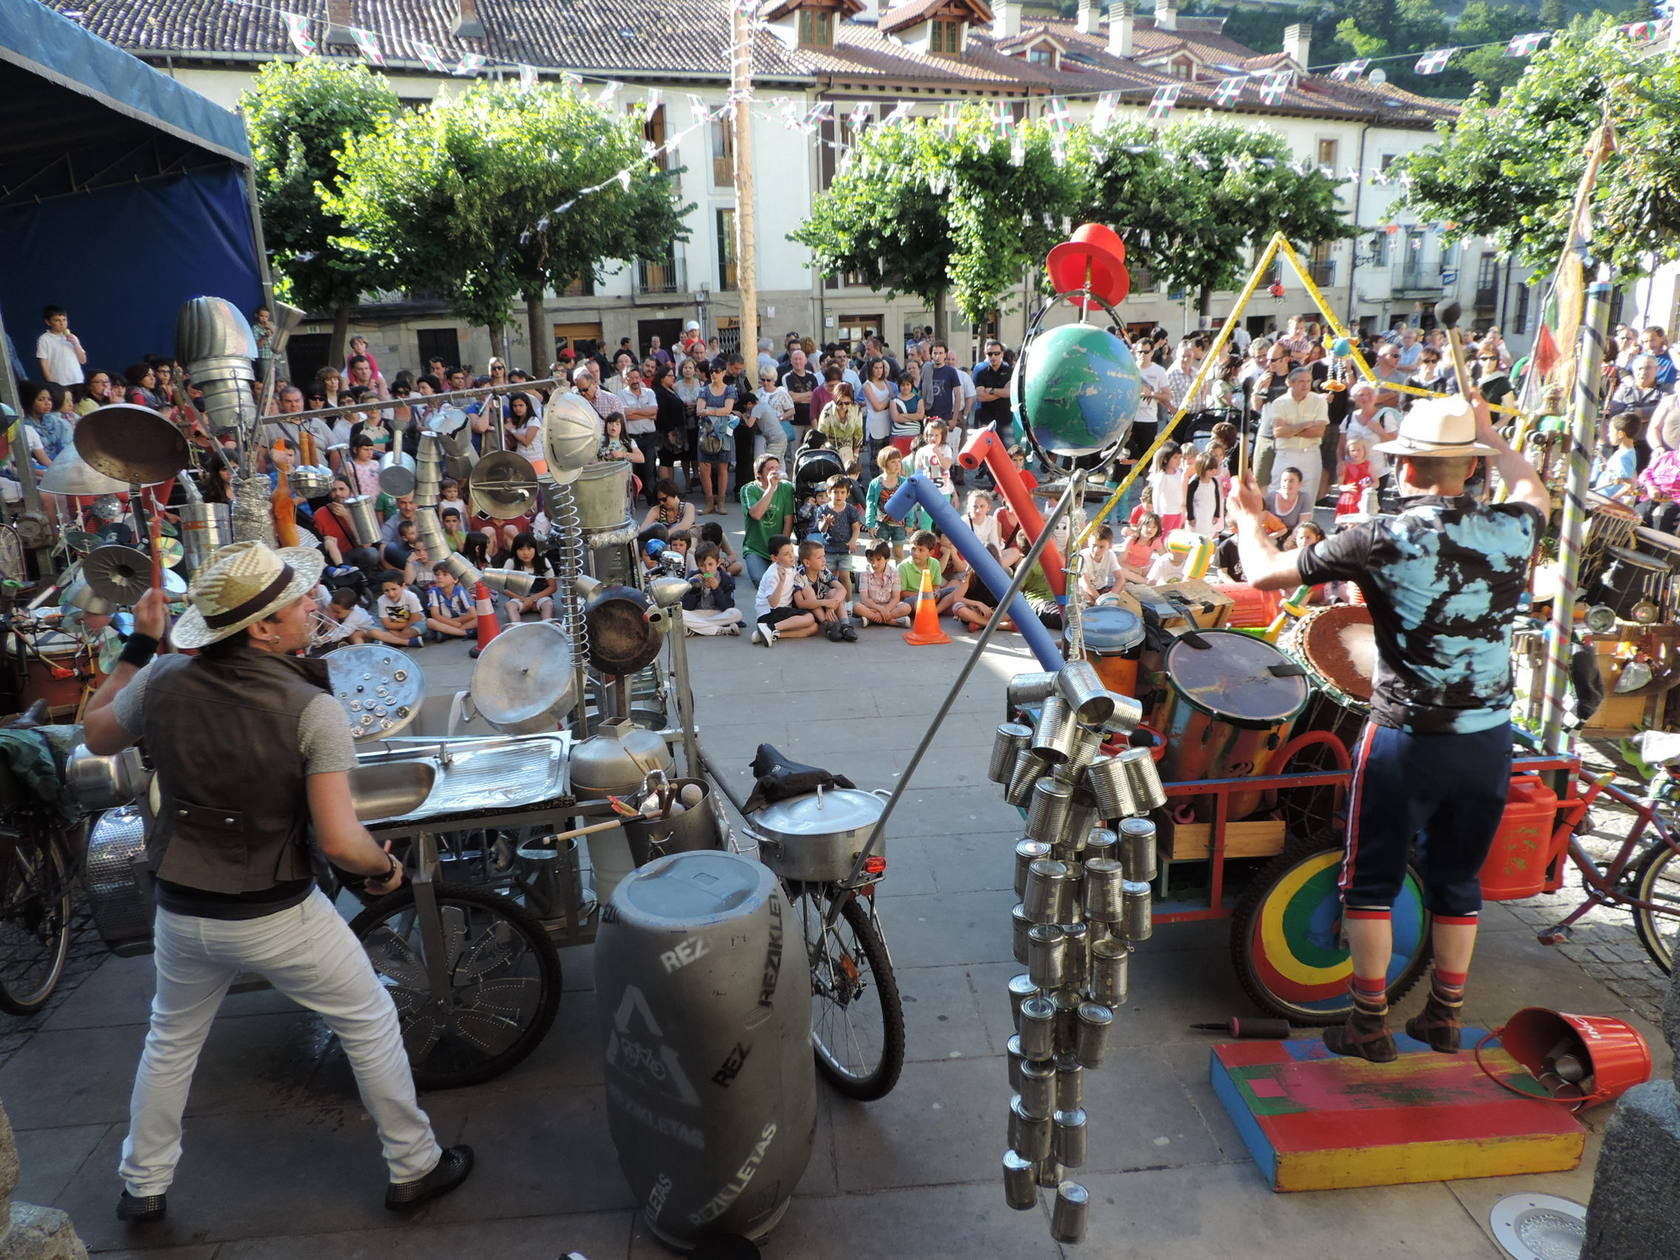 Éxito en San Pedro Jaiak 2013 en Eskoriatza